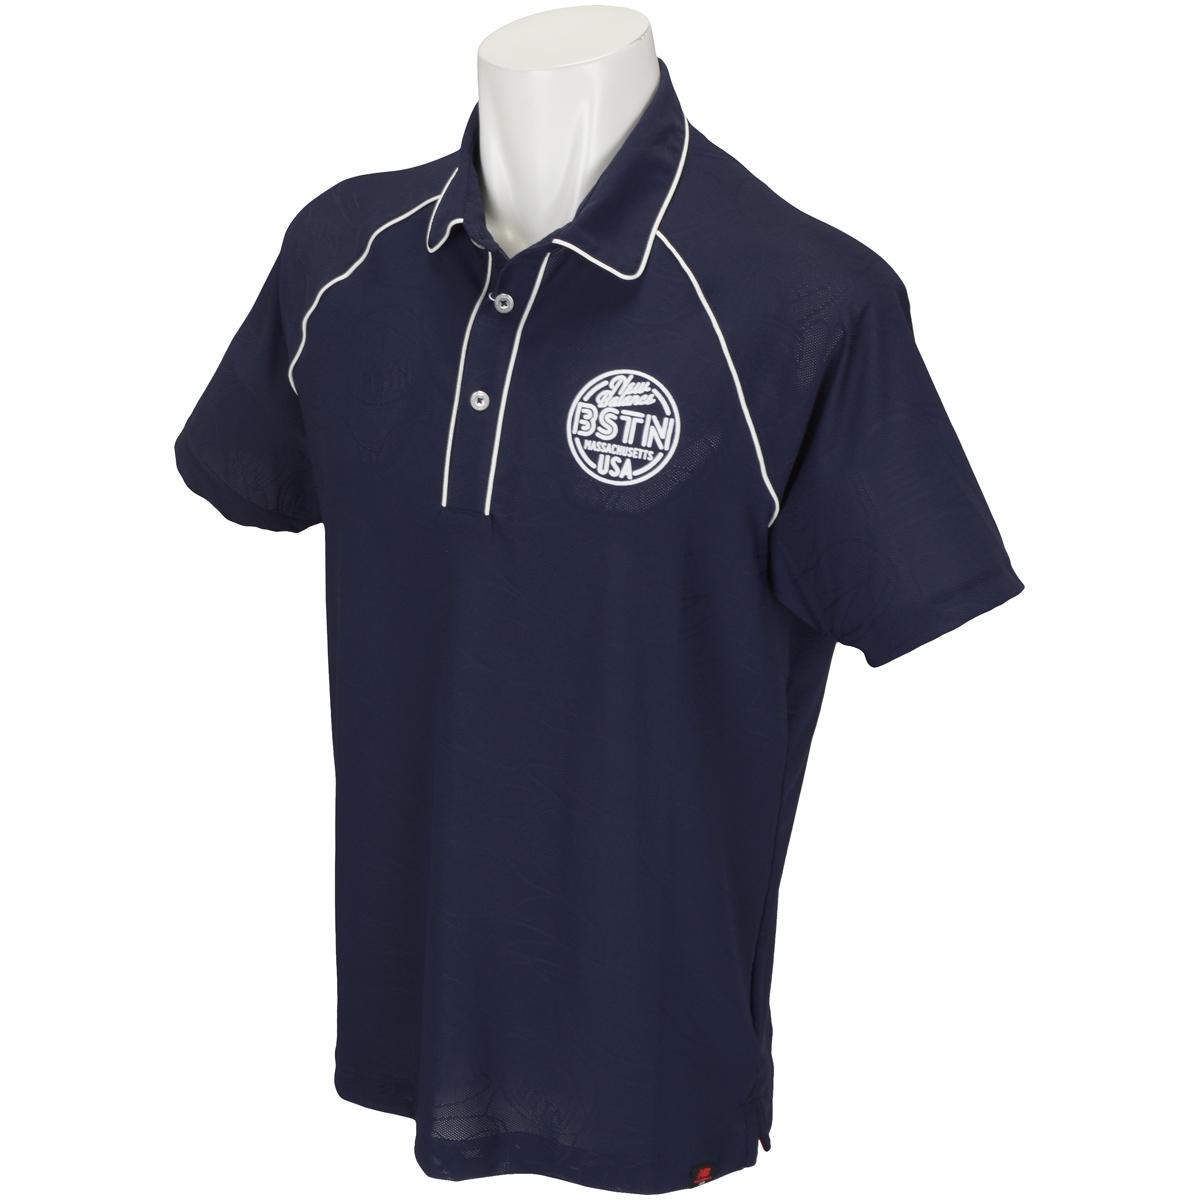 METRO ヘッドウェア半袖共衿ポロシャツ